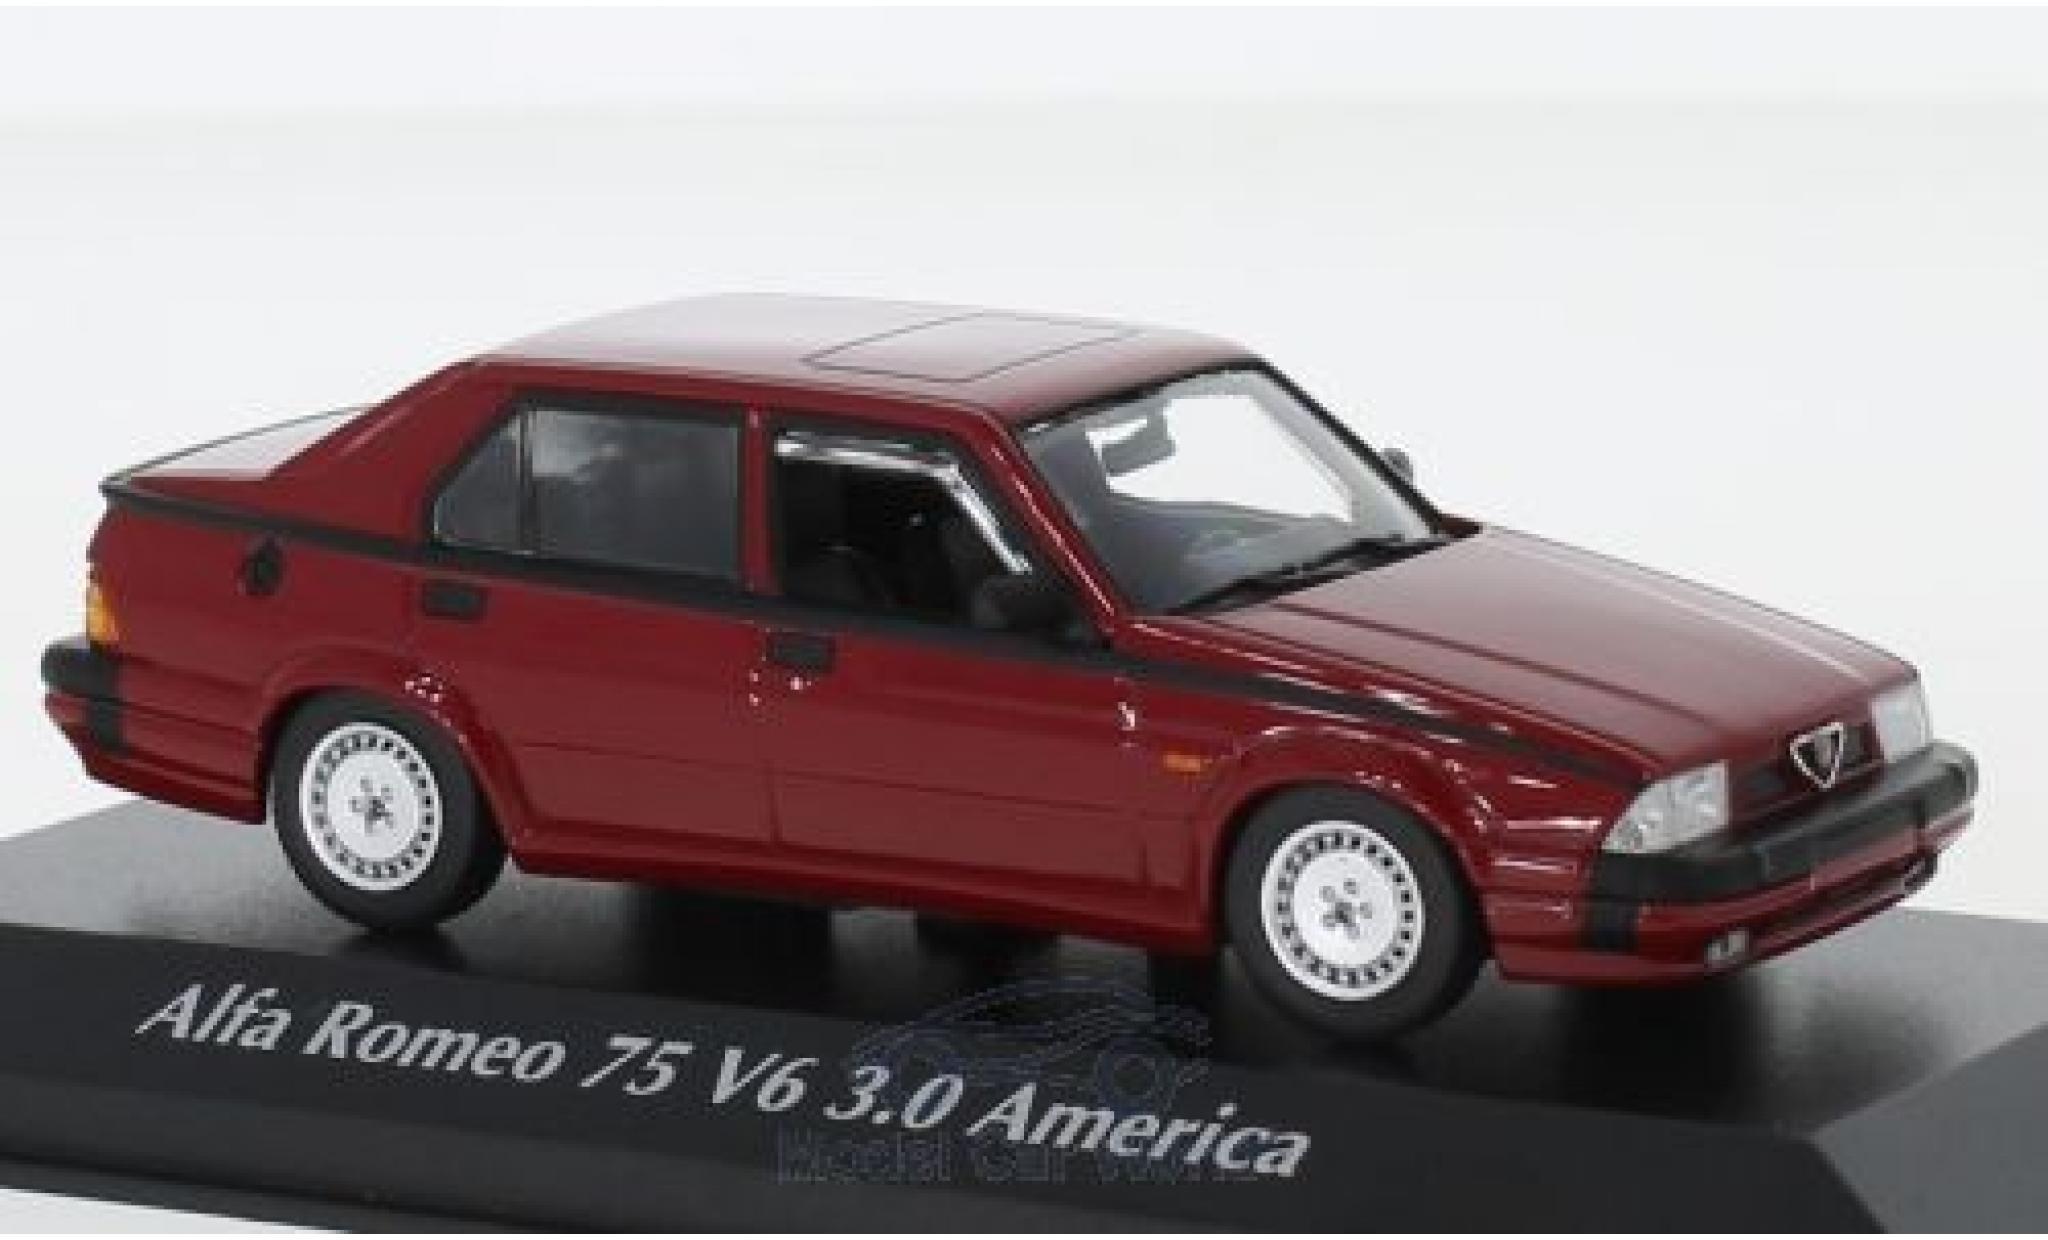 Alfa Romeo 75 1/43 Maxichamps V6 3.0 America rouge 1987